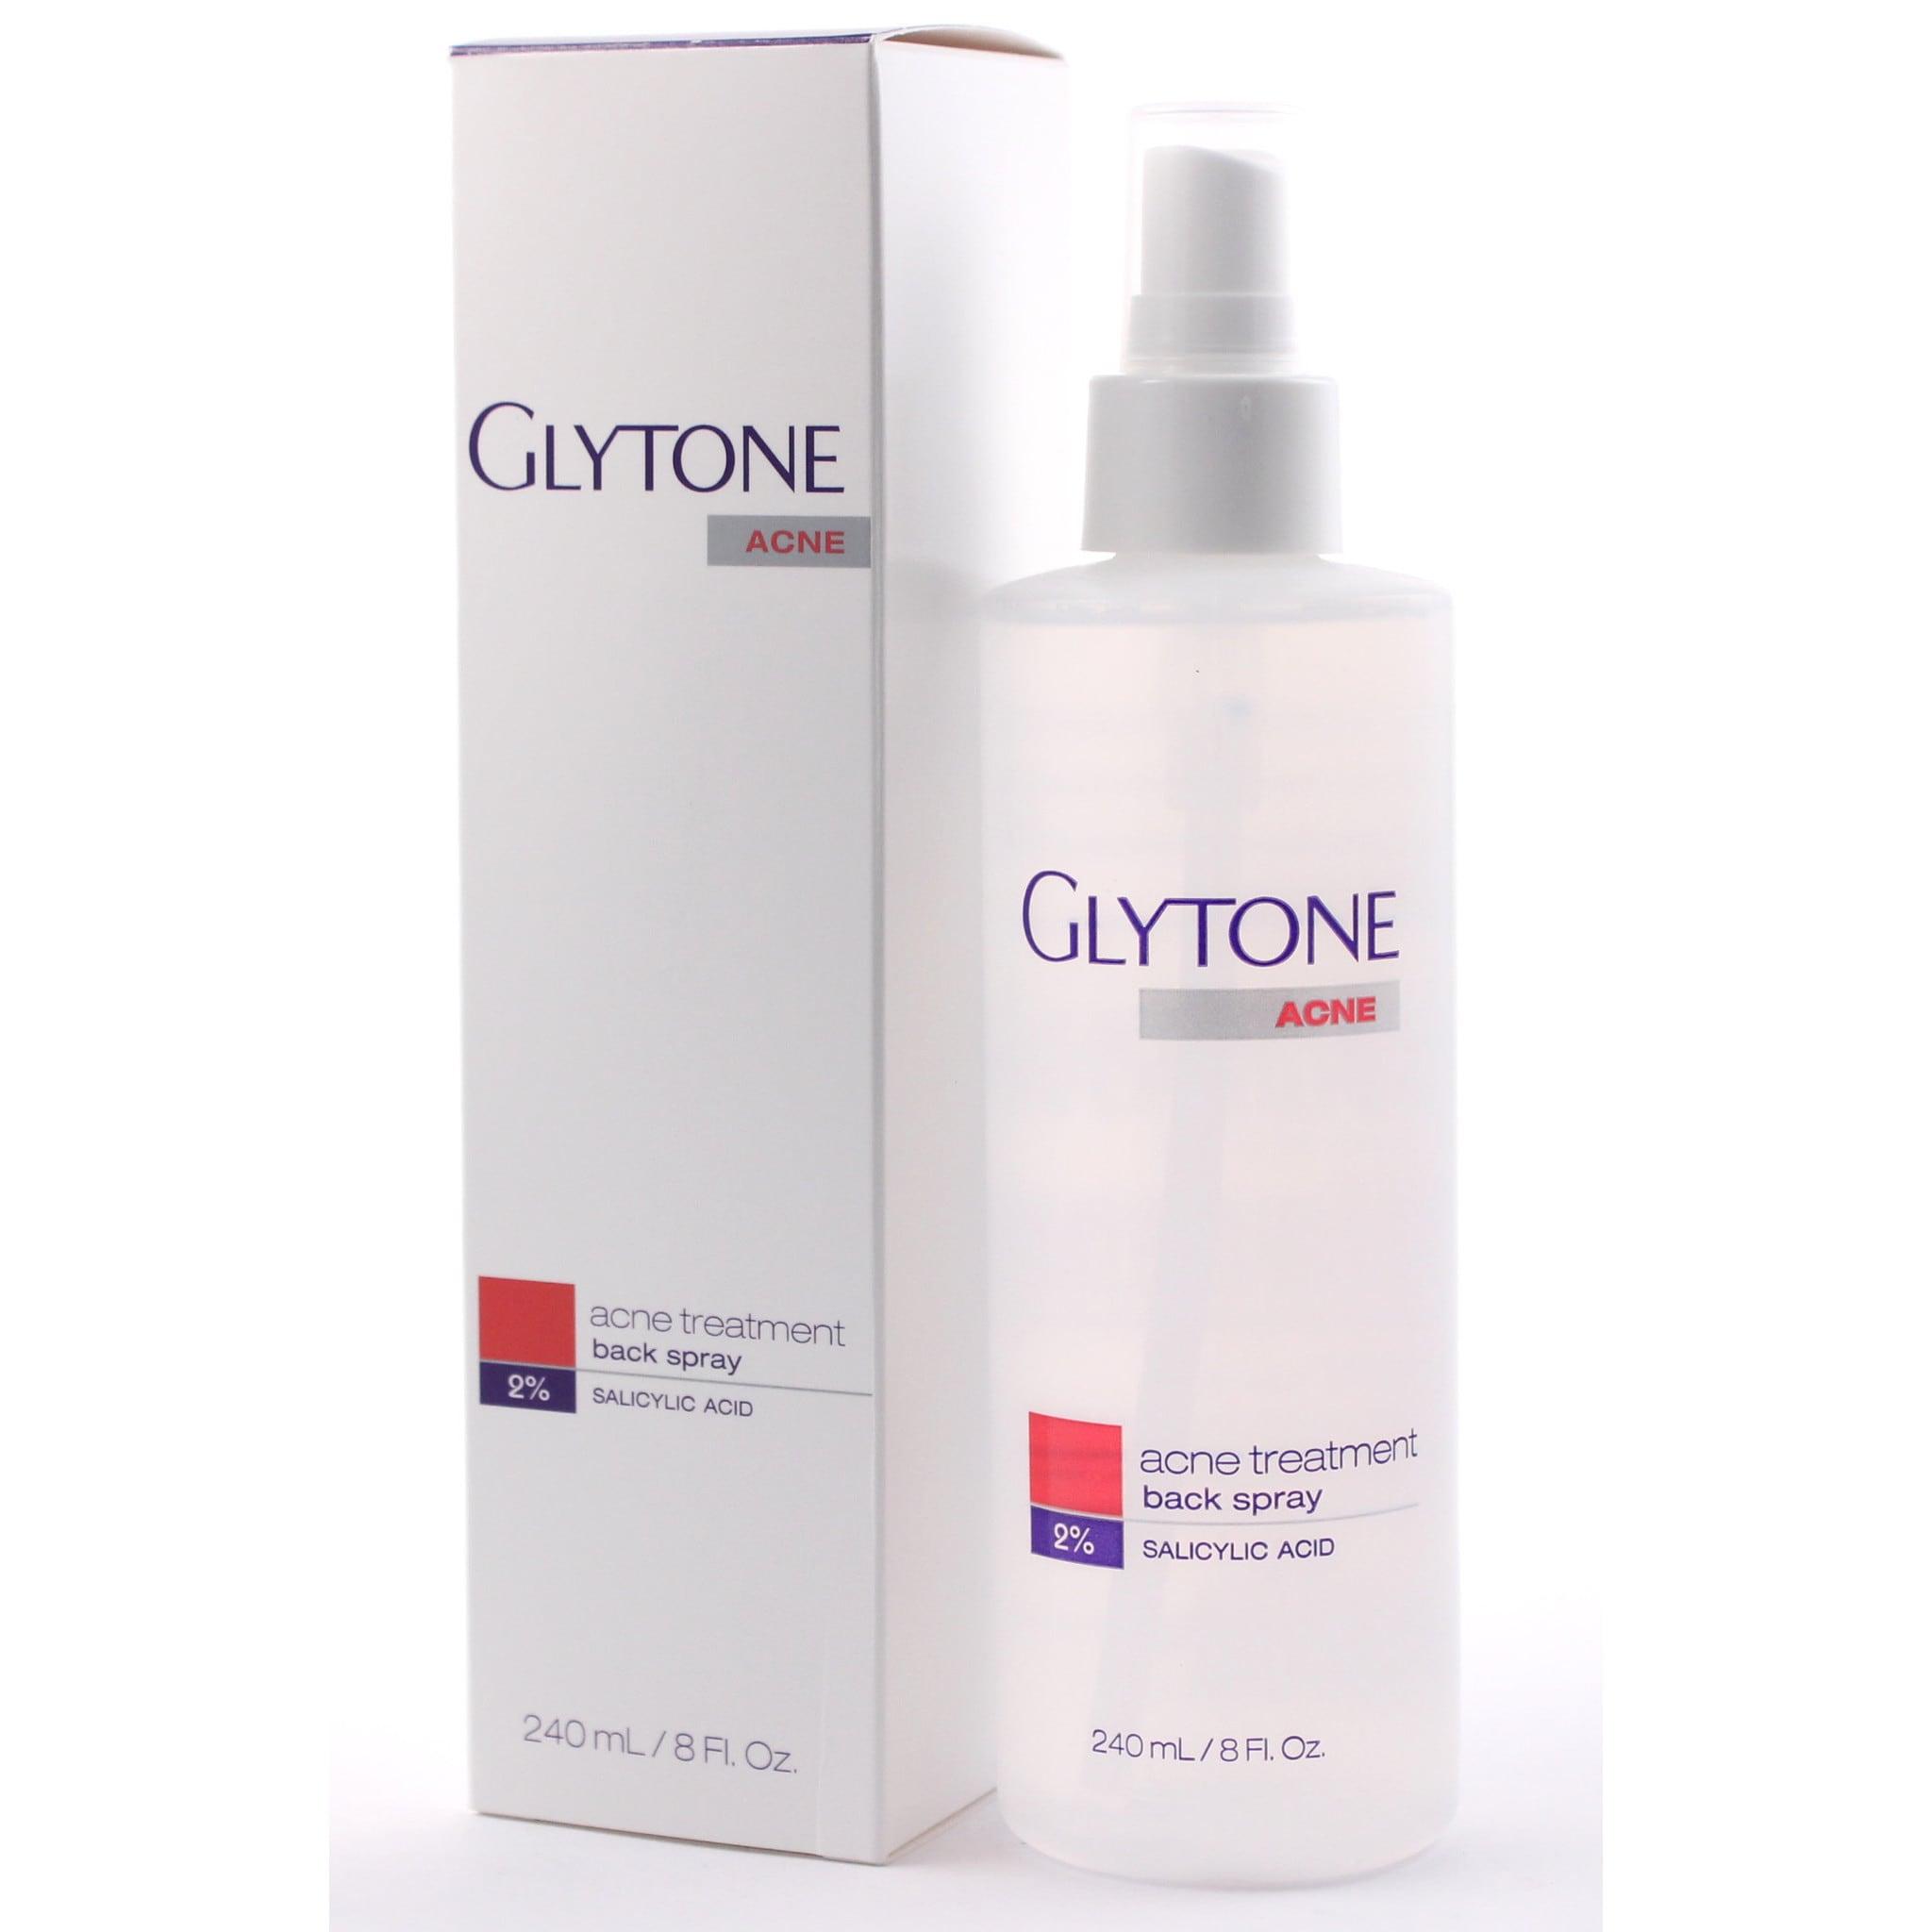 Shop Glytone Back Acne 8 Ounce 2 Percent Salicylic Acid Spray